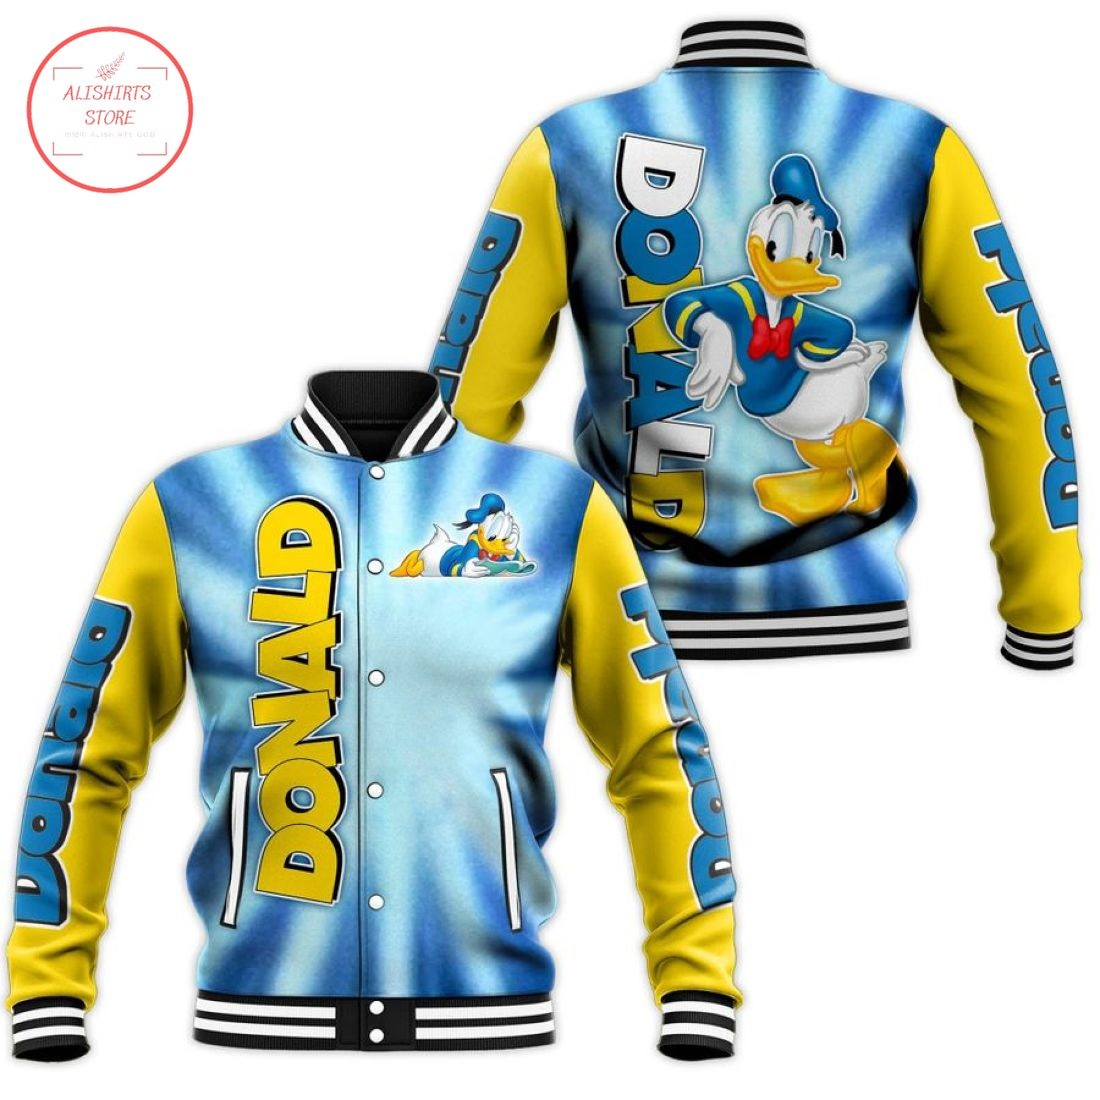 Disney Donald Duck Letterman Jacket